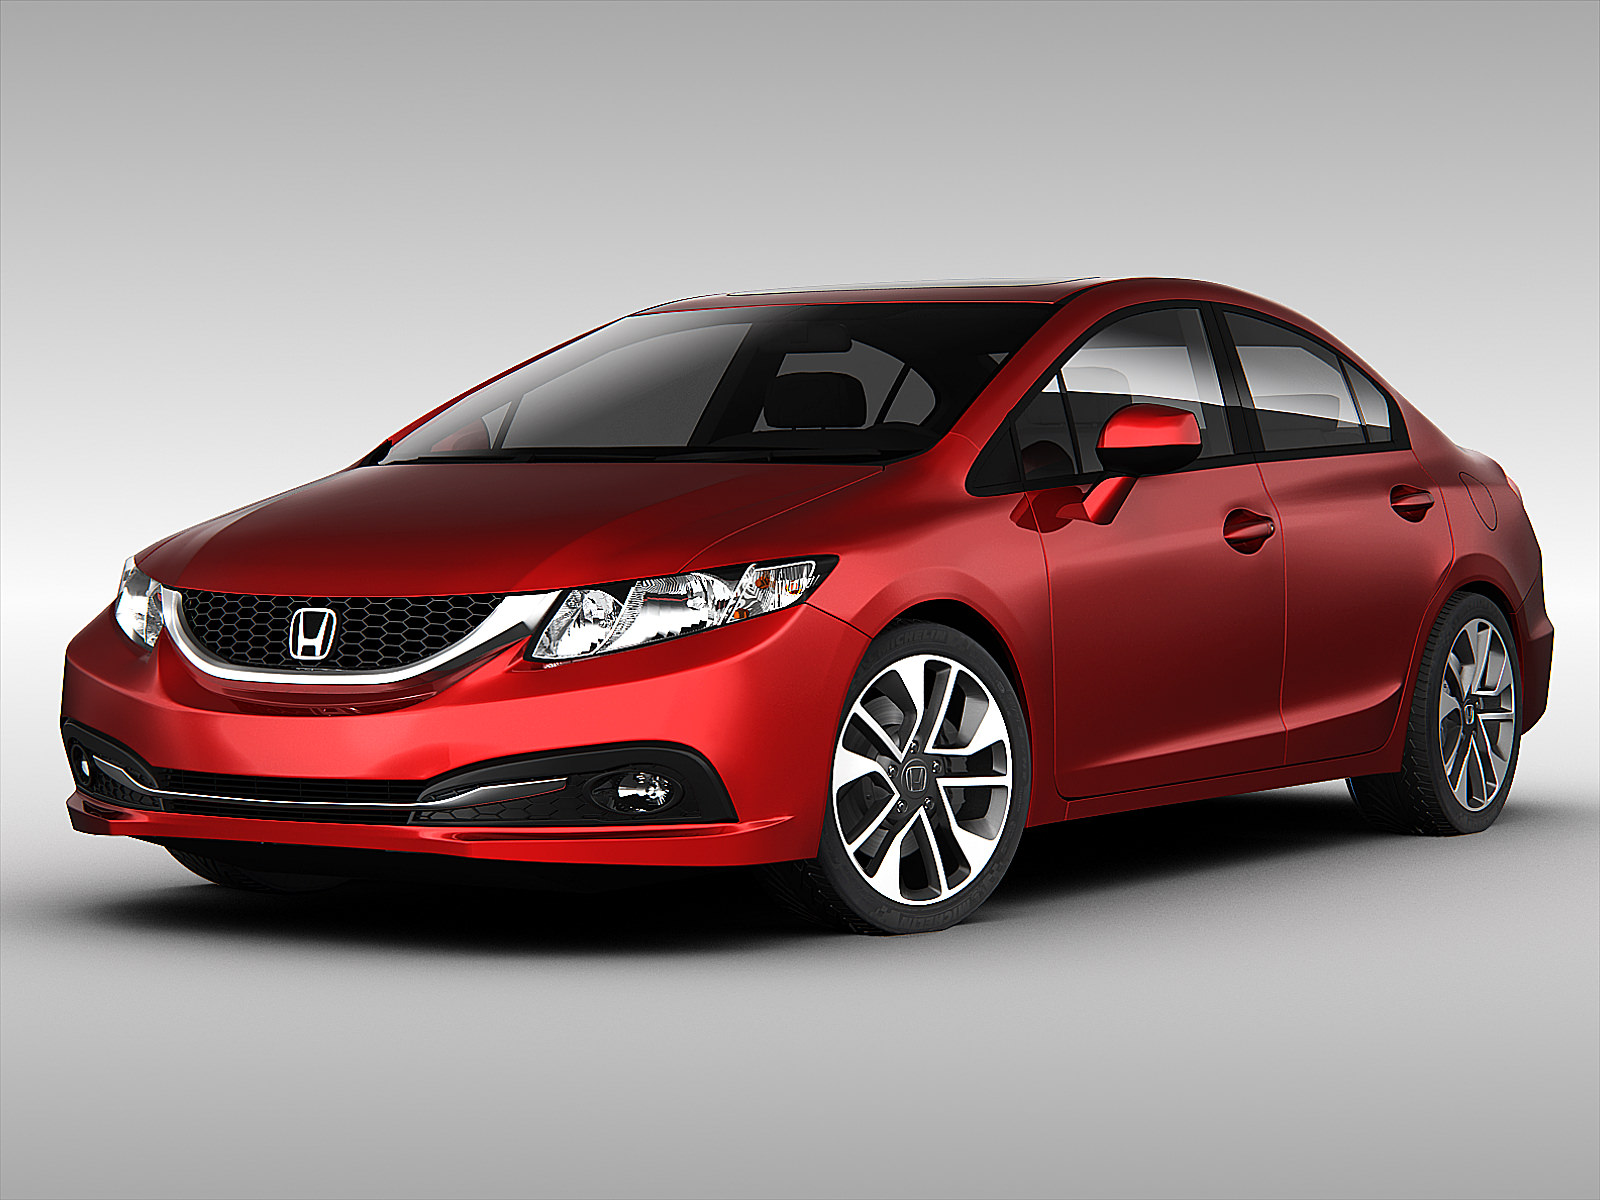 Honda civic 2013 3d model max obj 3ds fbx for 94 honda civic